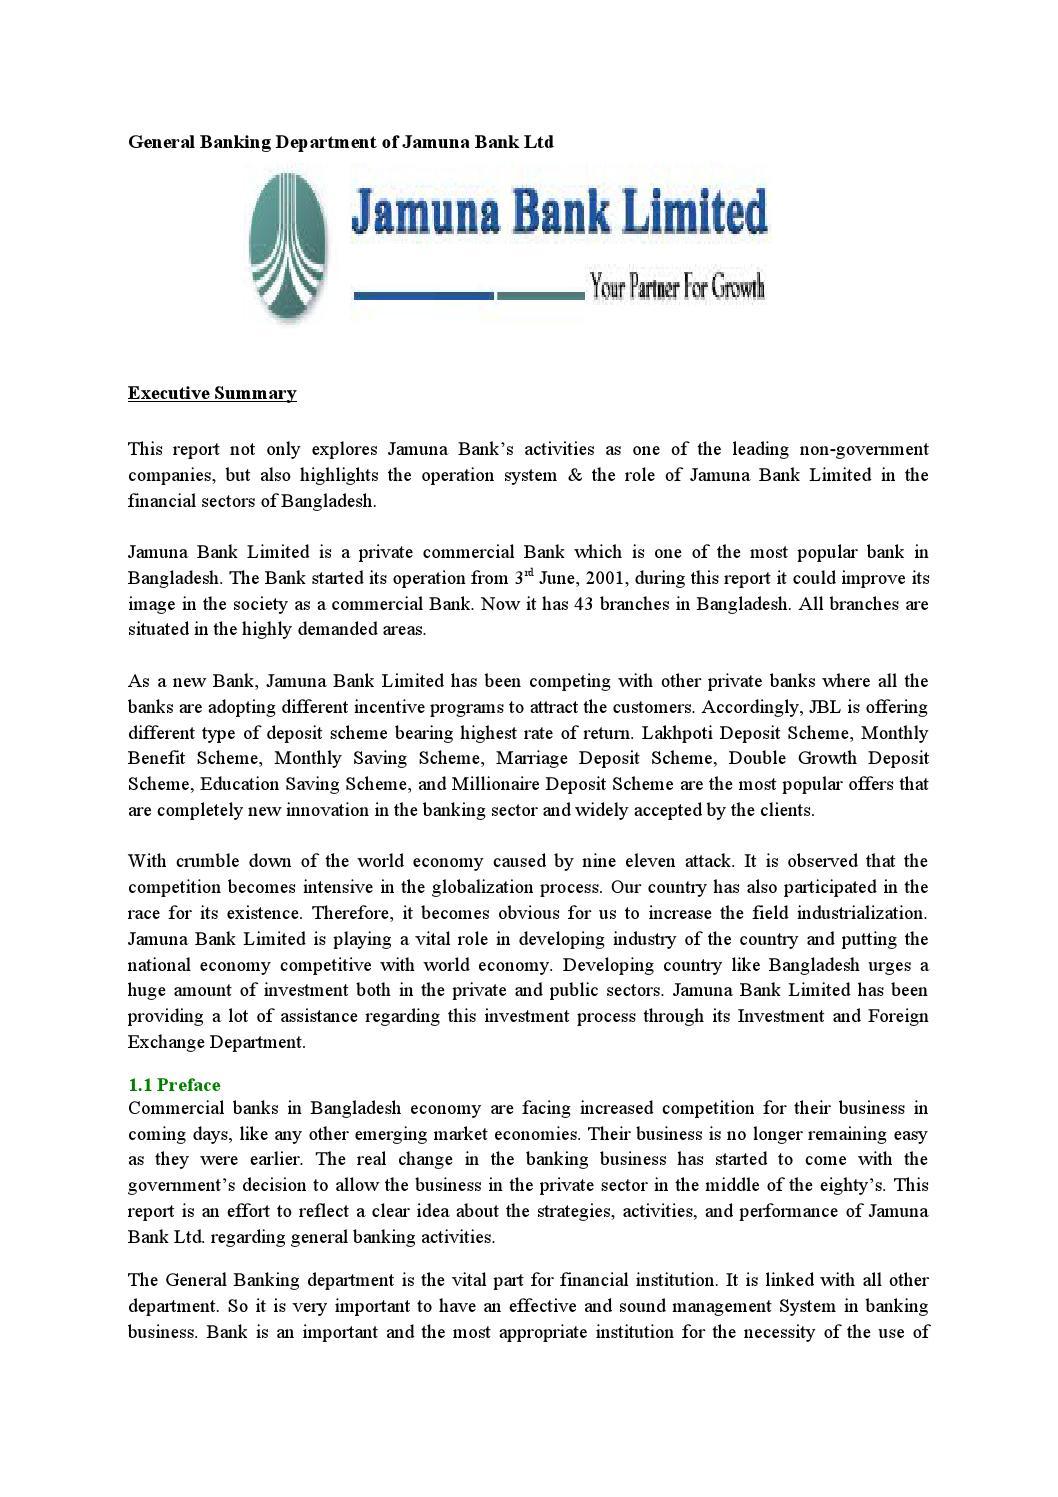 general activities of jamuna bank ltd Md tanveer haider sohaib executive officer at jamuna bank ltd  md tanveer haider sohaib's activity  all kinds of general banking activities in the bank.